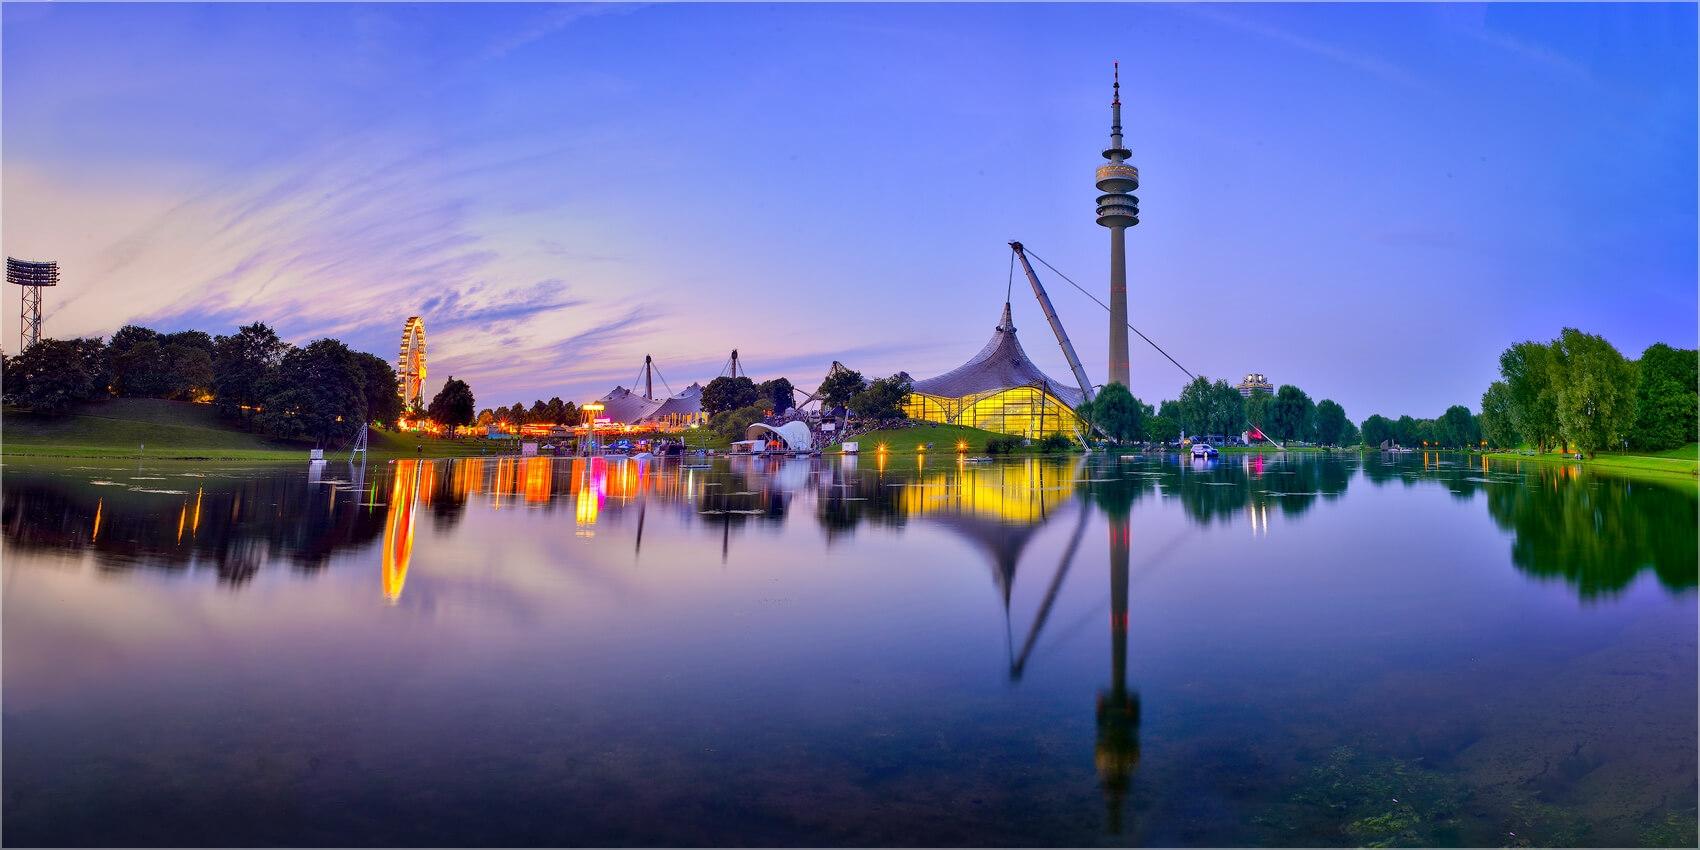 Panoramabild Fernsehturm Olympiapark München